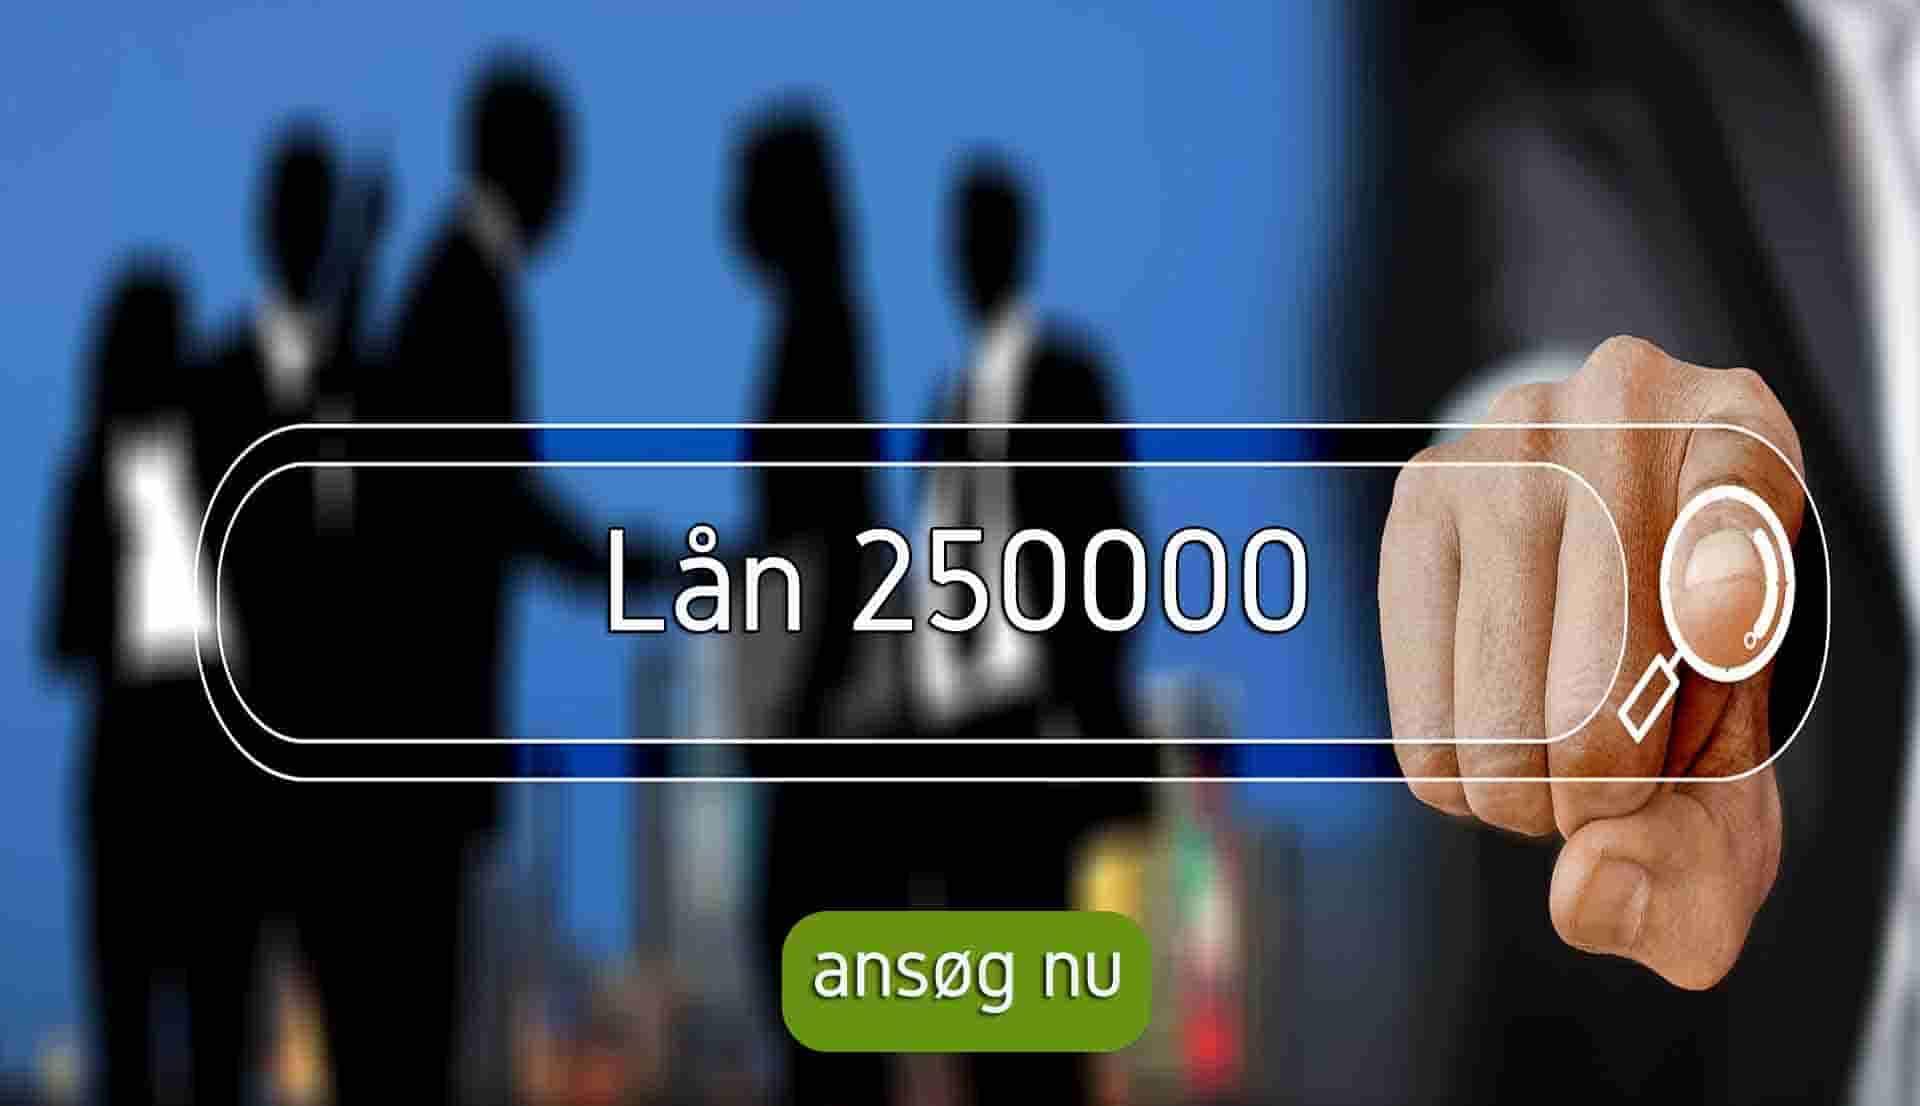 lån 250000